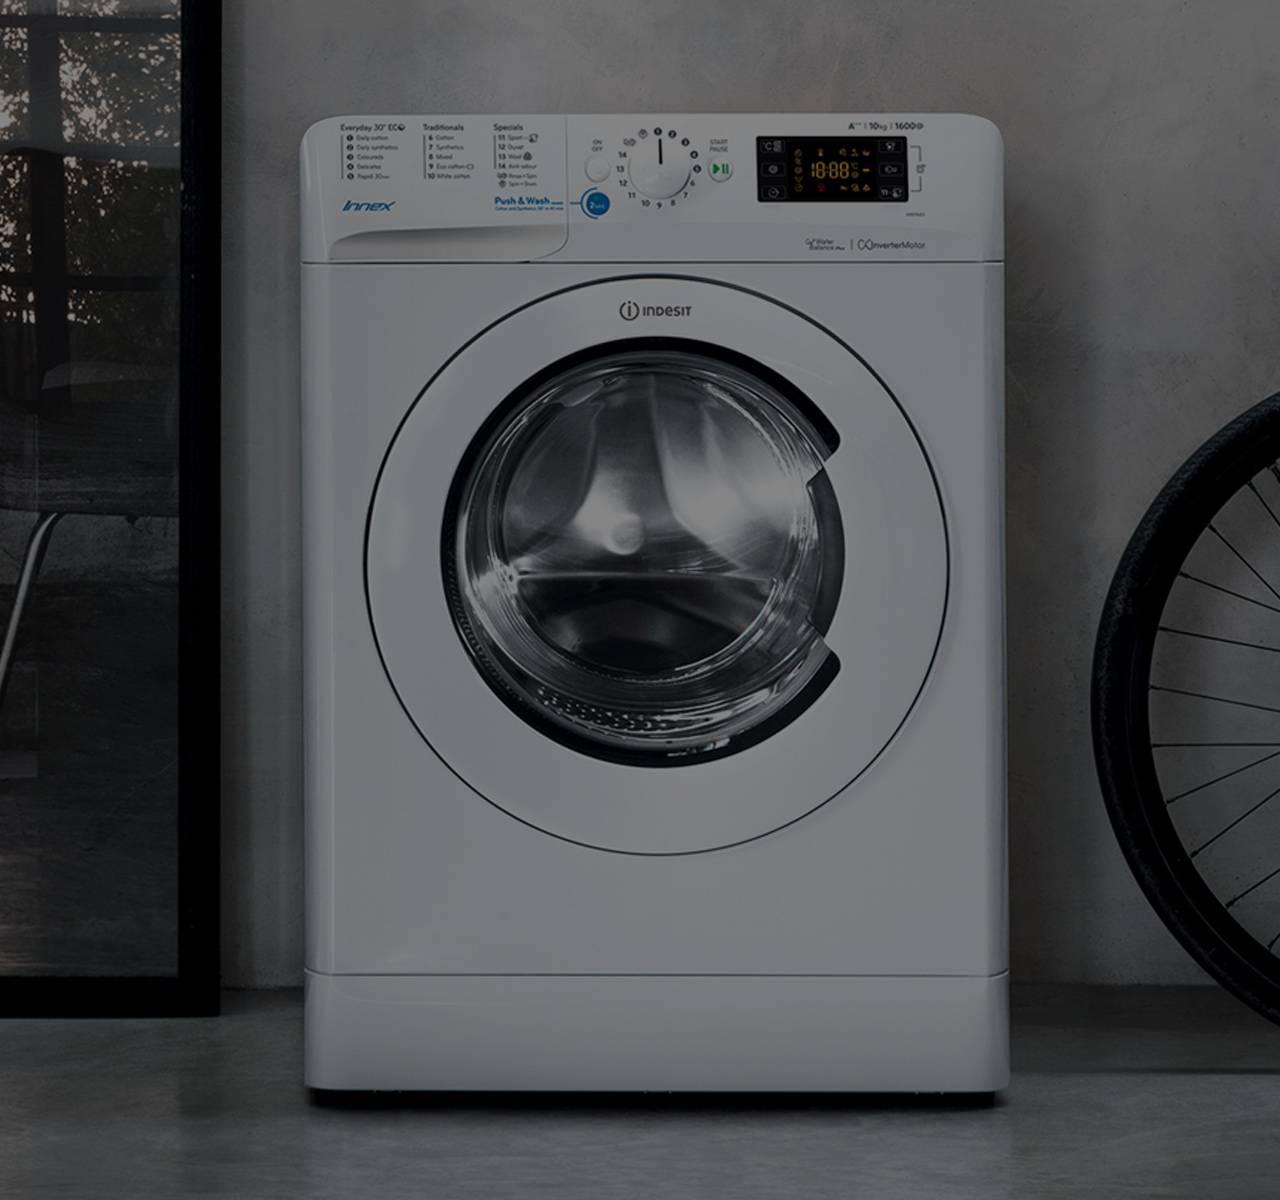 Washing machine Indesit IWSB 5085: characteristics, instruction, faults, reviews 42